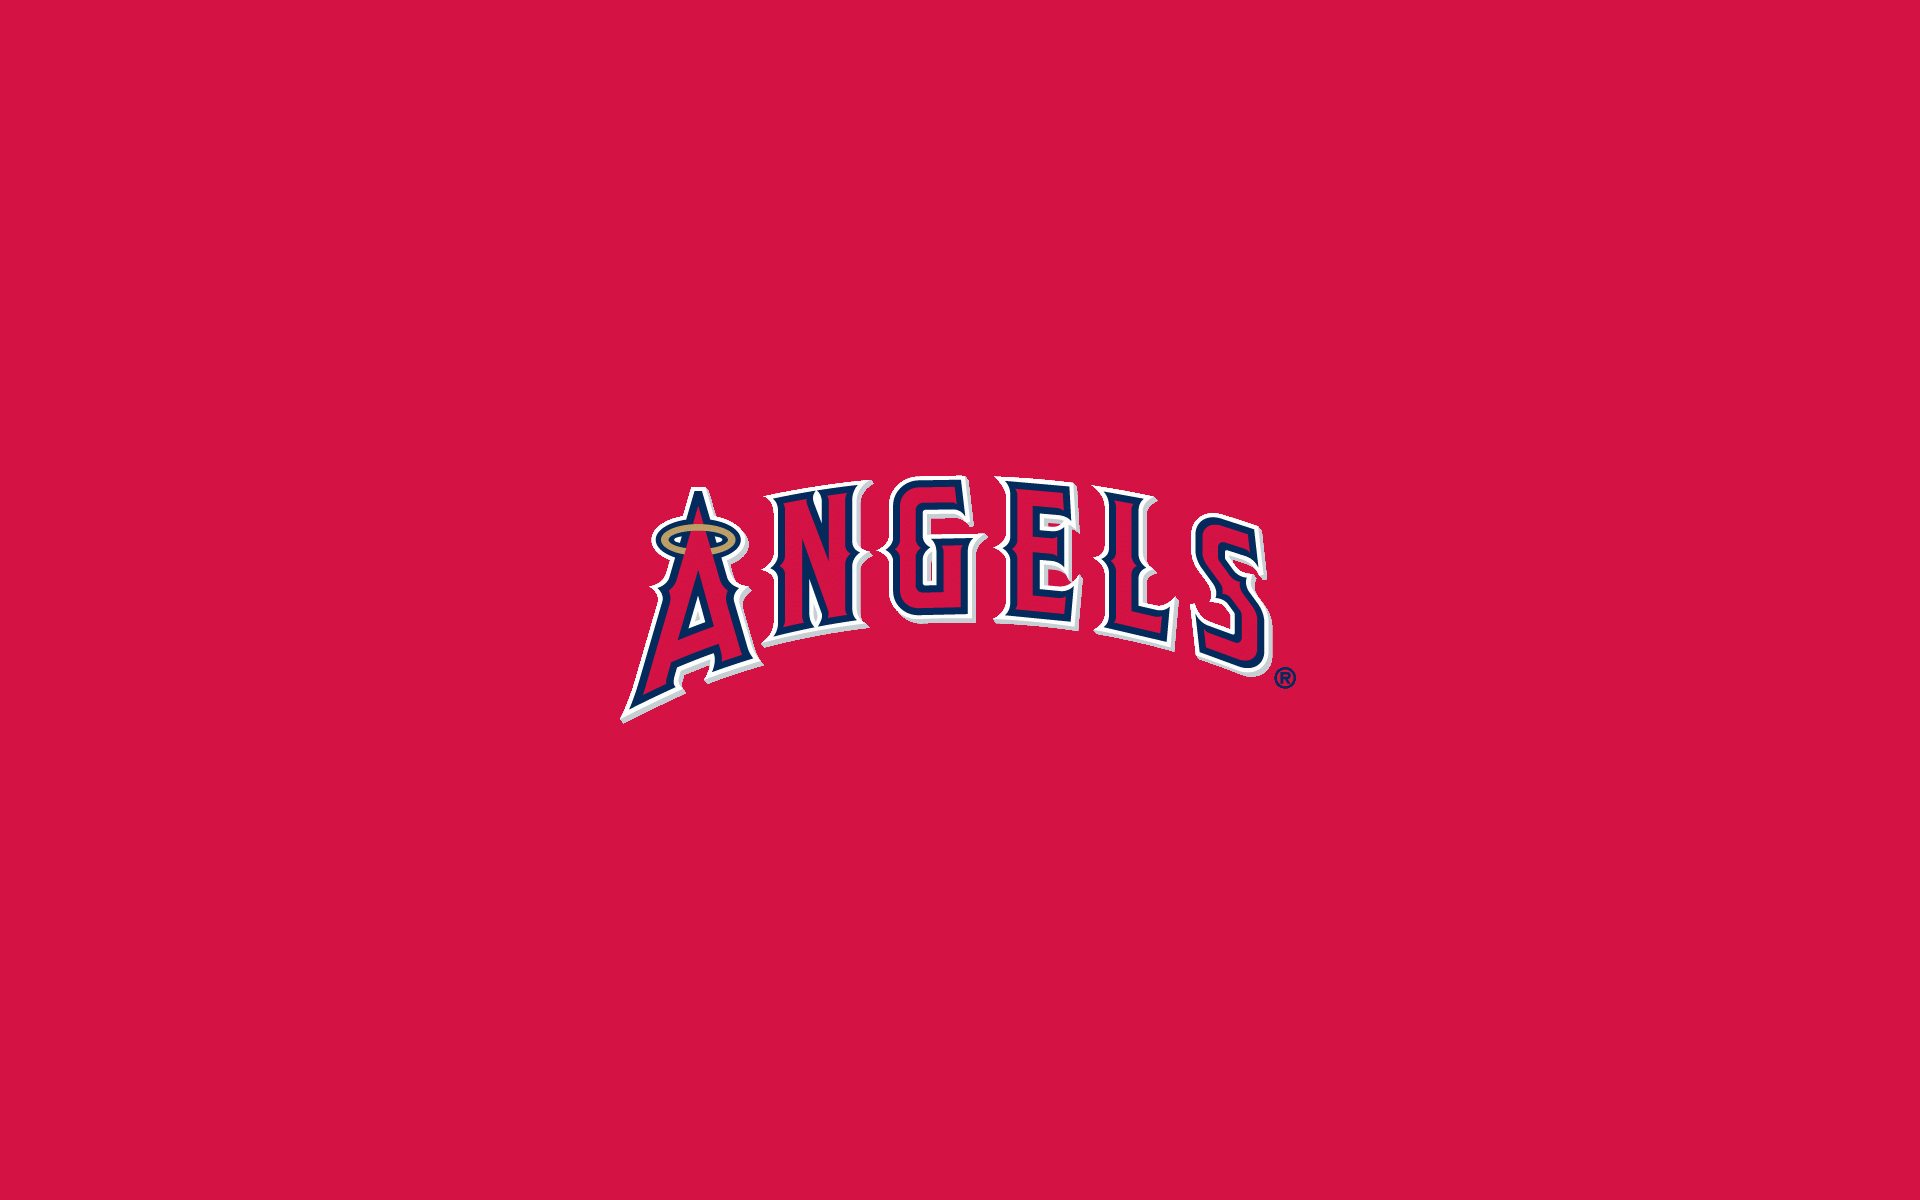 ANAHEIM ANGELS baseball mlb g wallpaper 1920x1200 1920x1200